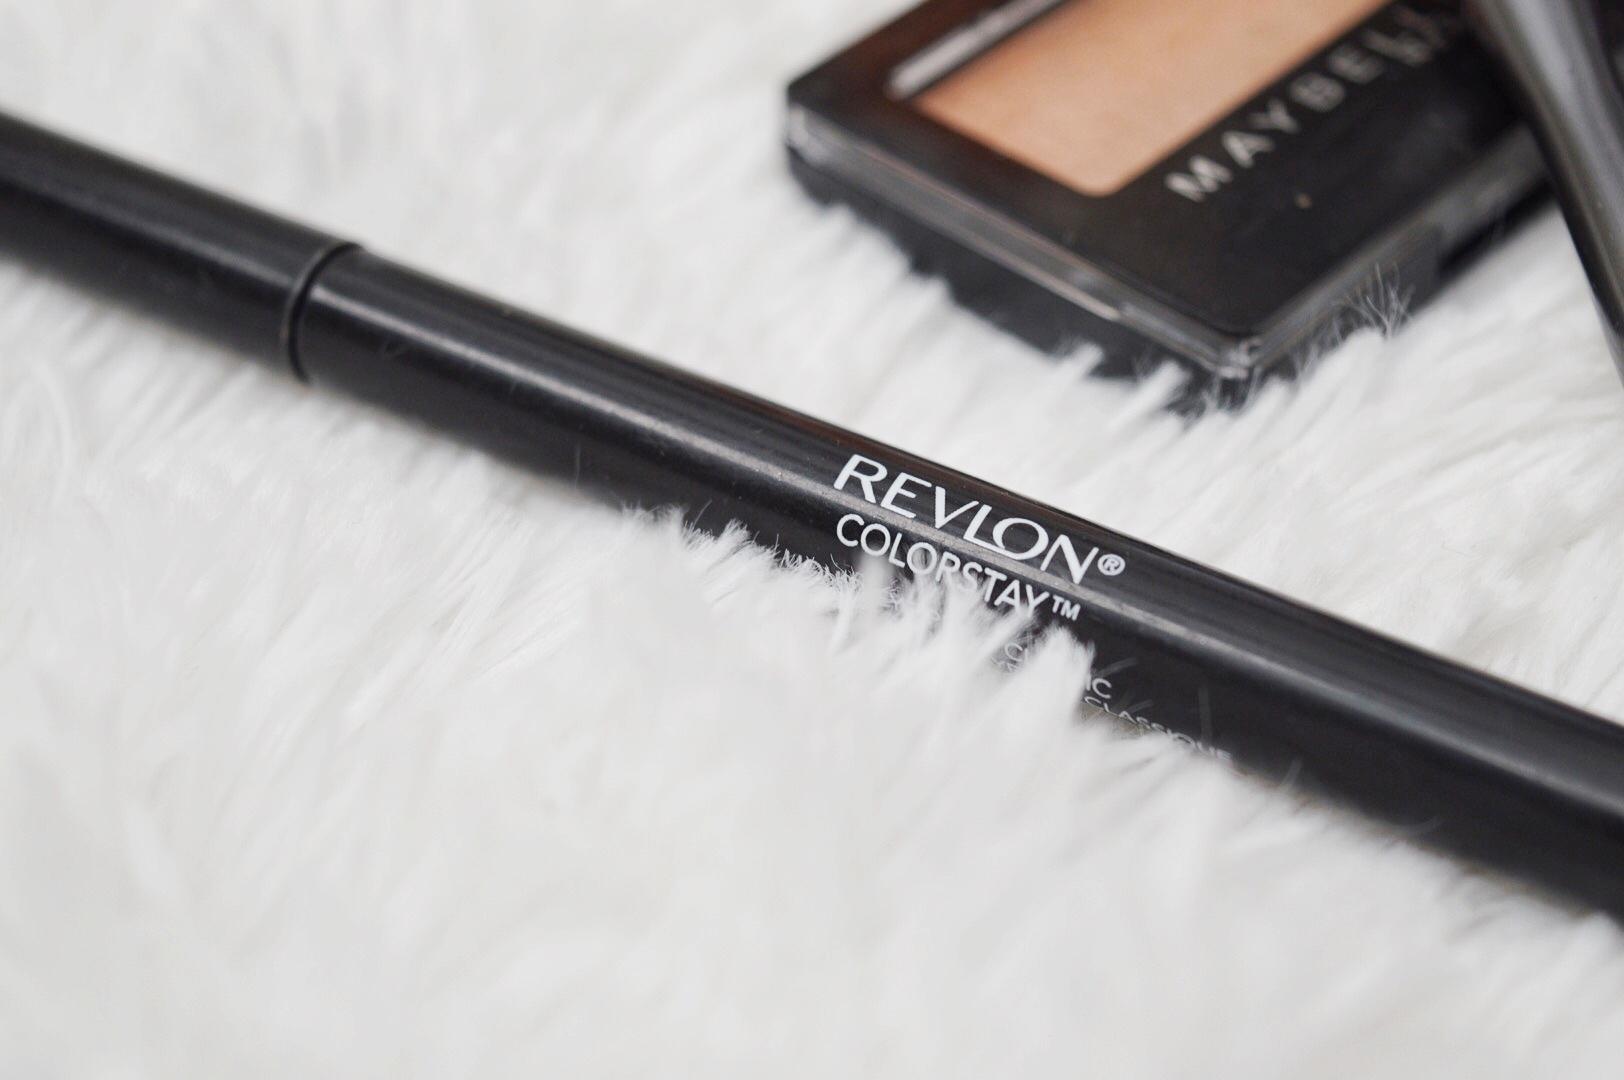 Revlon Colorstay Liquid Eyeliner